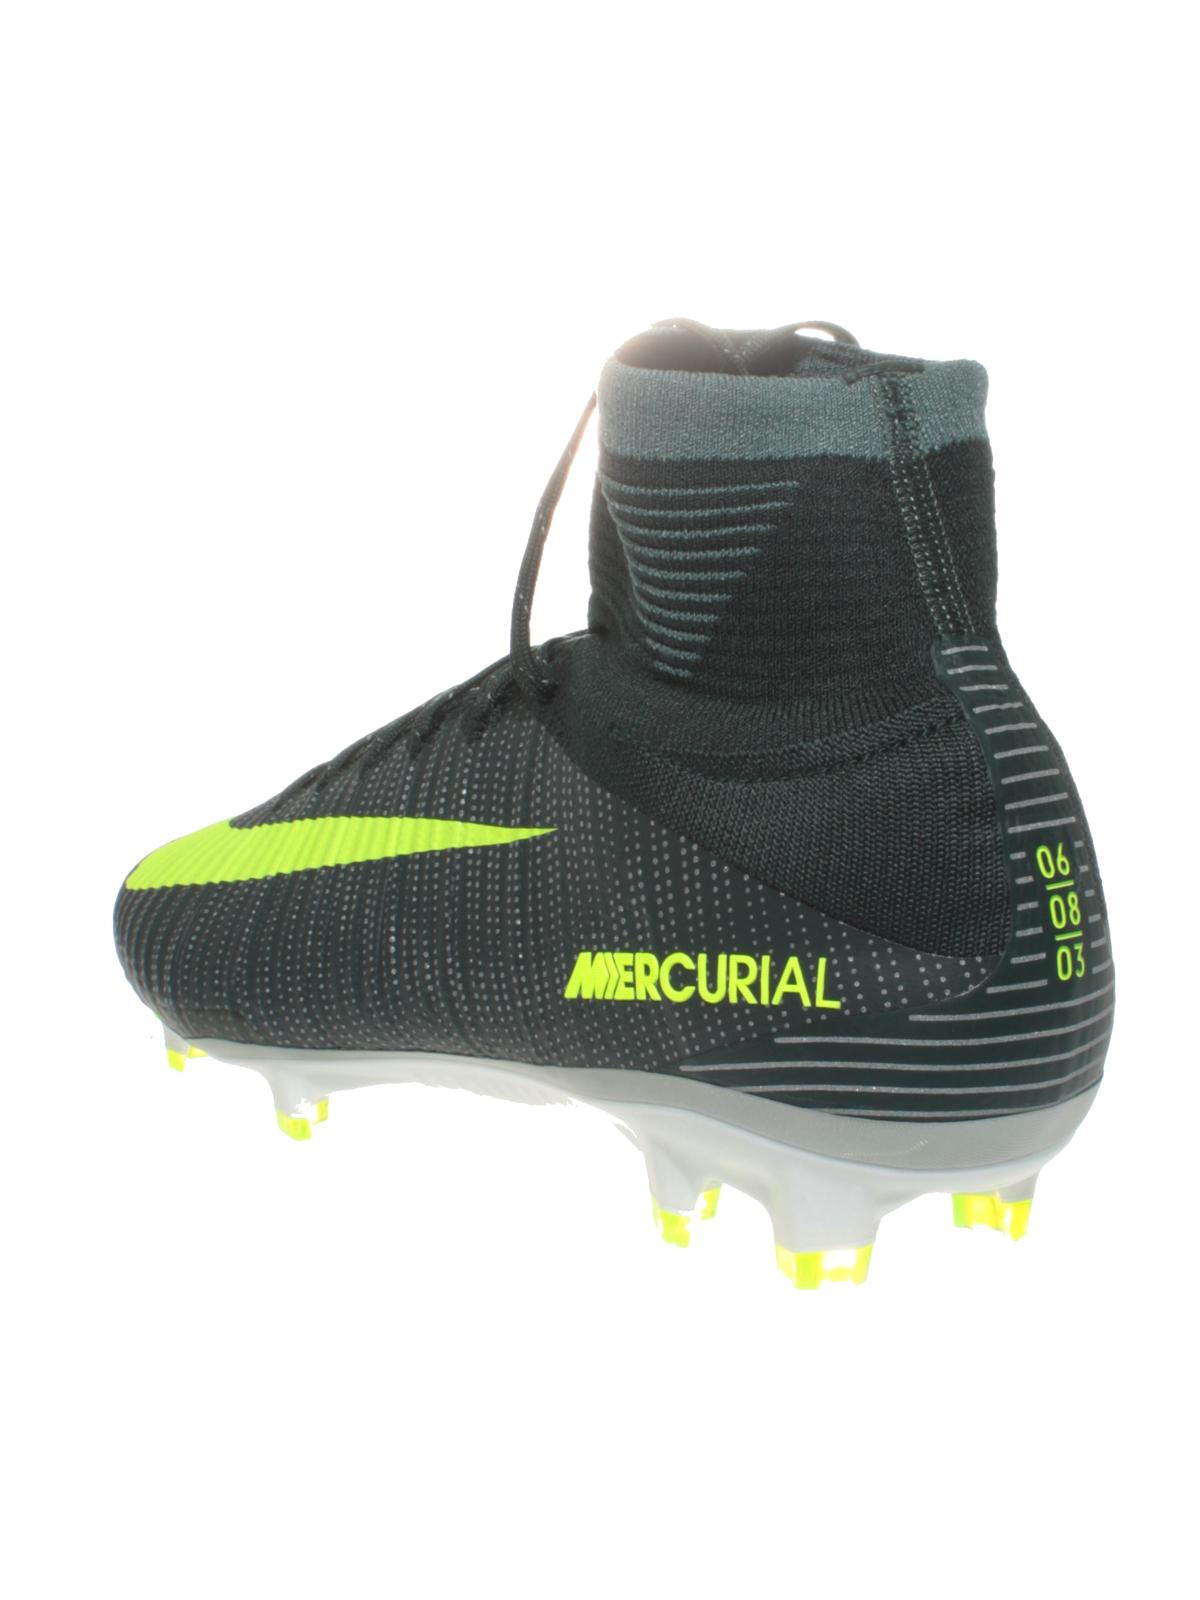 Details zu Nike Fußball Schuhe CR7 Mercurial Superfly FG 852511 376 Socke Fußballschuhe